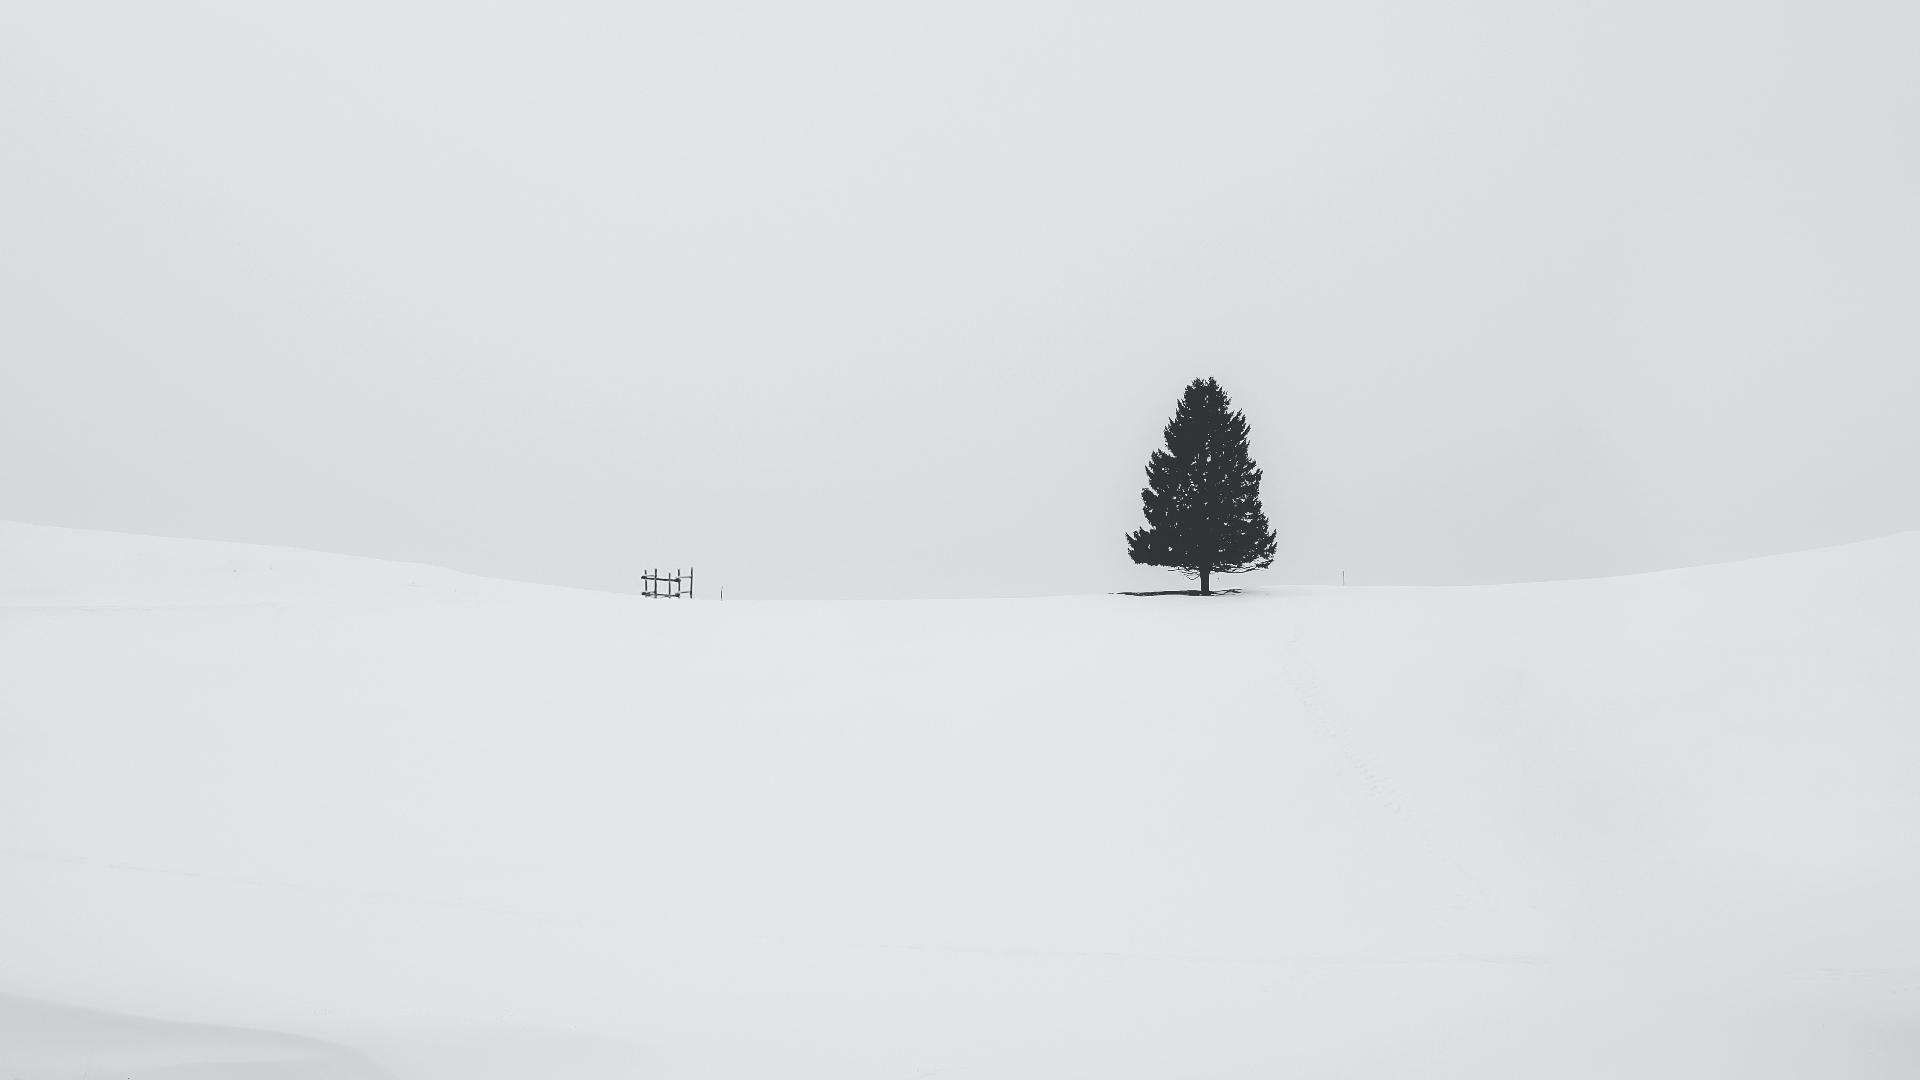 General 1920x1080 landscape trees snow winter